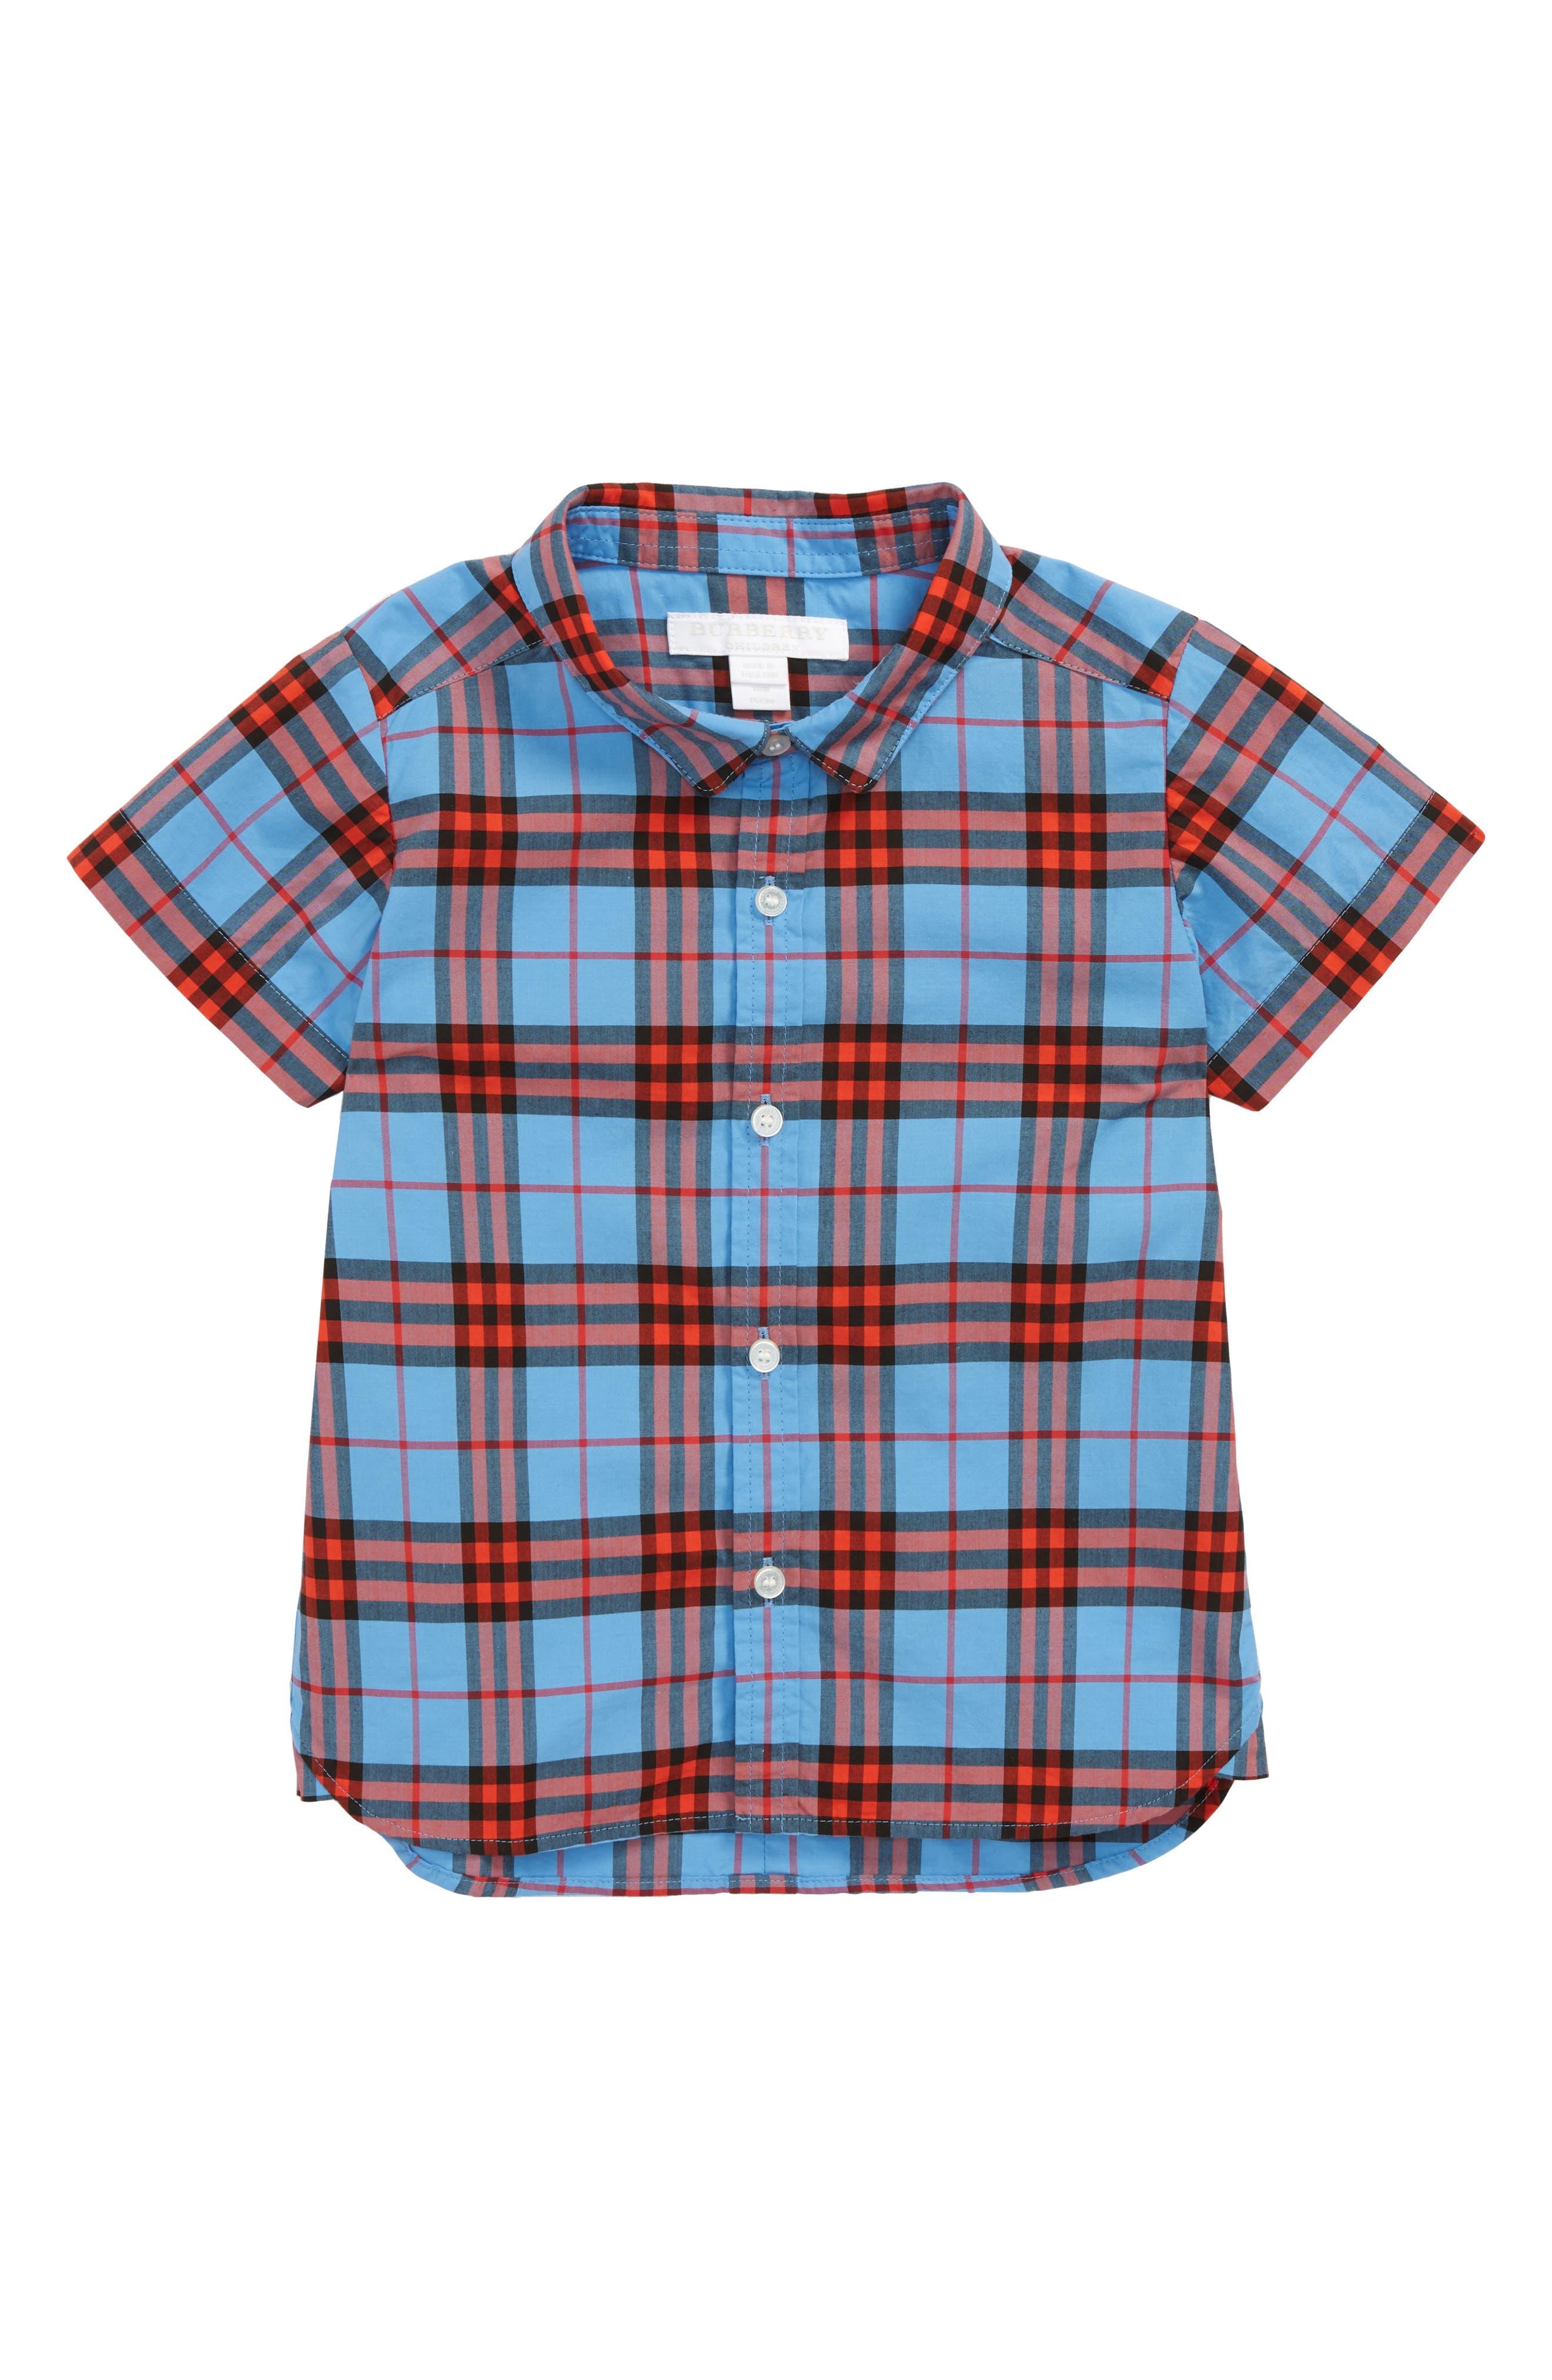 Burberry Clarkey Plaid Woven Shirt (Baby Boys)